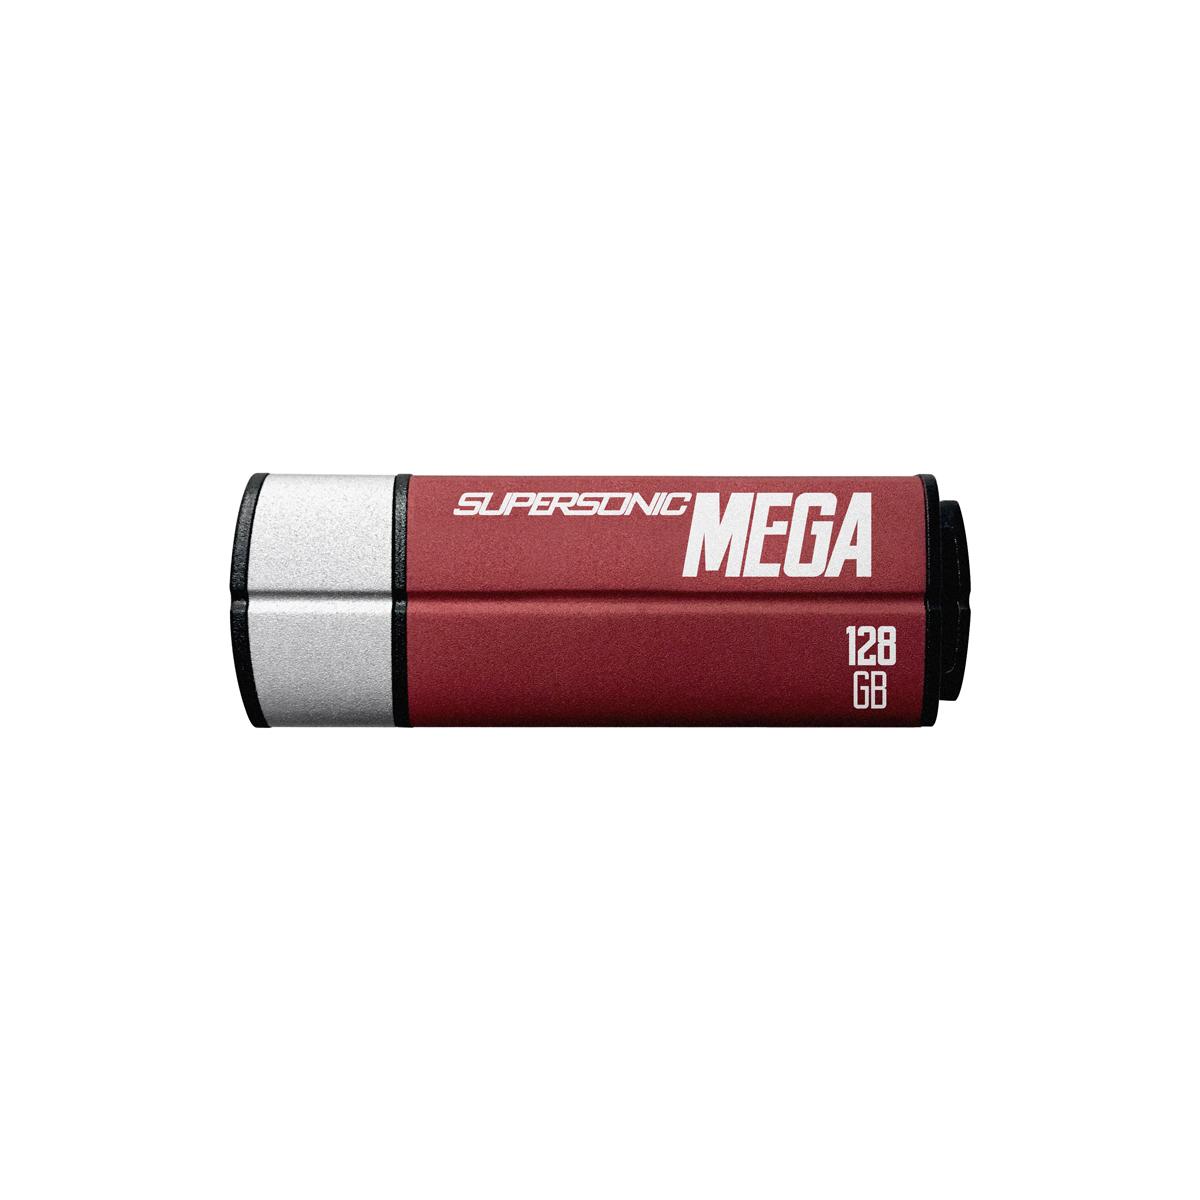 Flash disk Patriot Mega 128GB USB 3.1